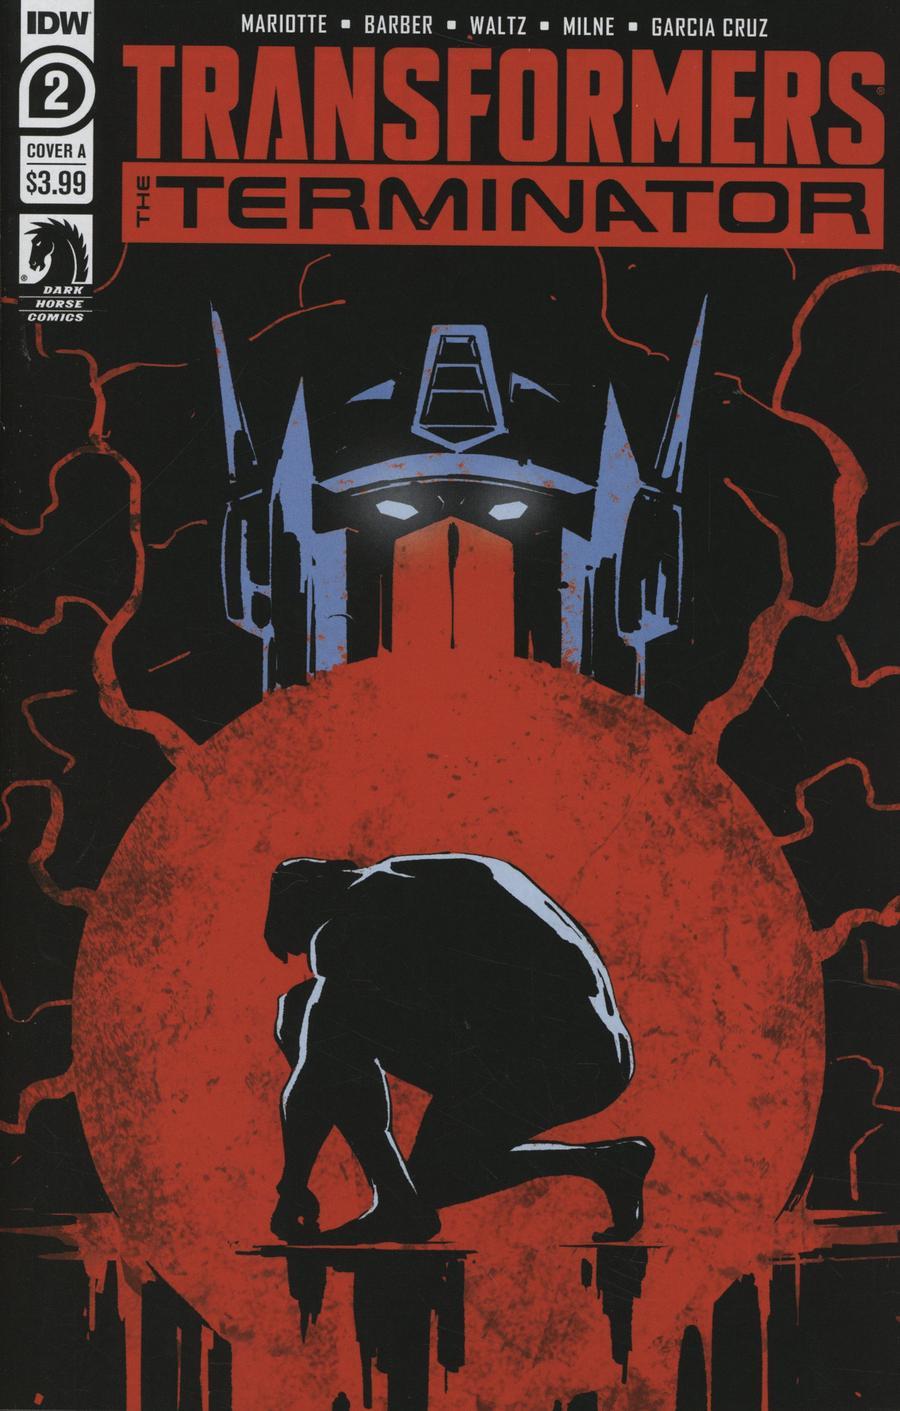 Transformers vs Terminator #2 Cover A Regular Gavin Fullerton Cover